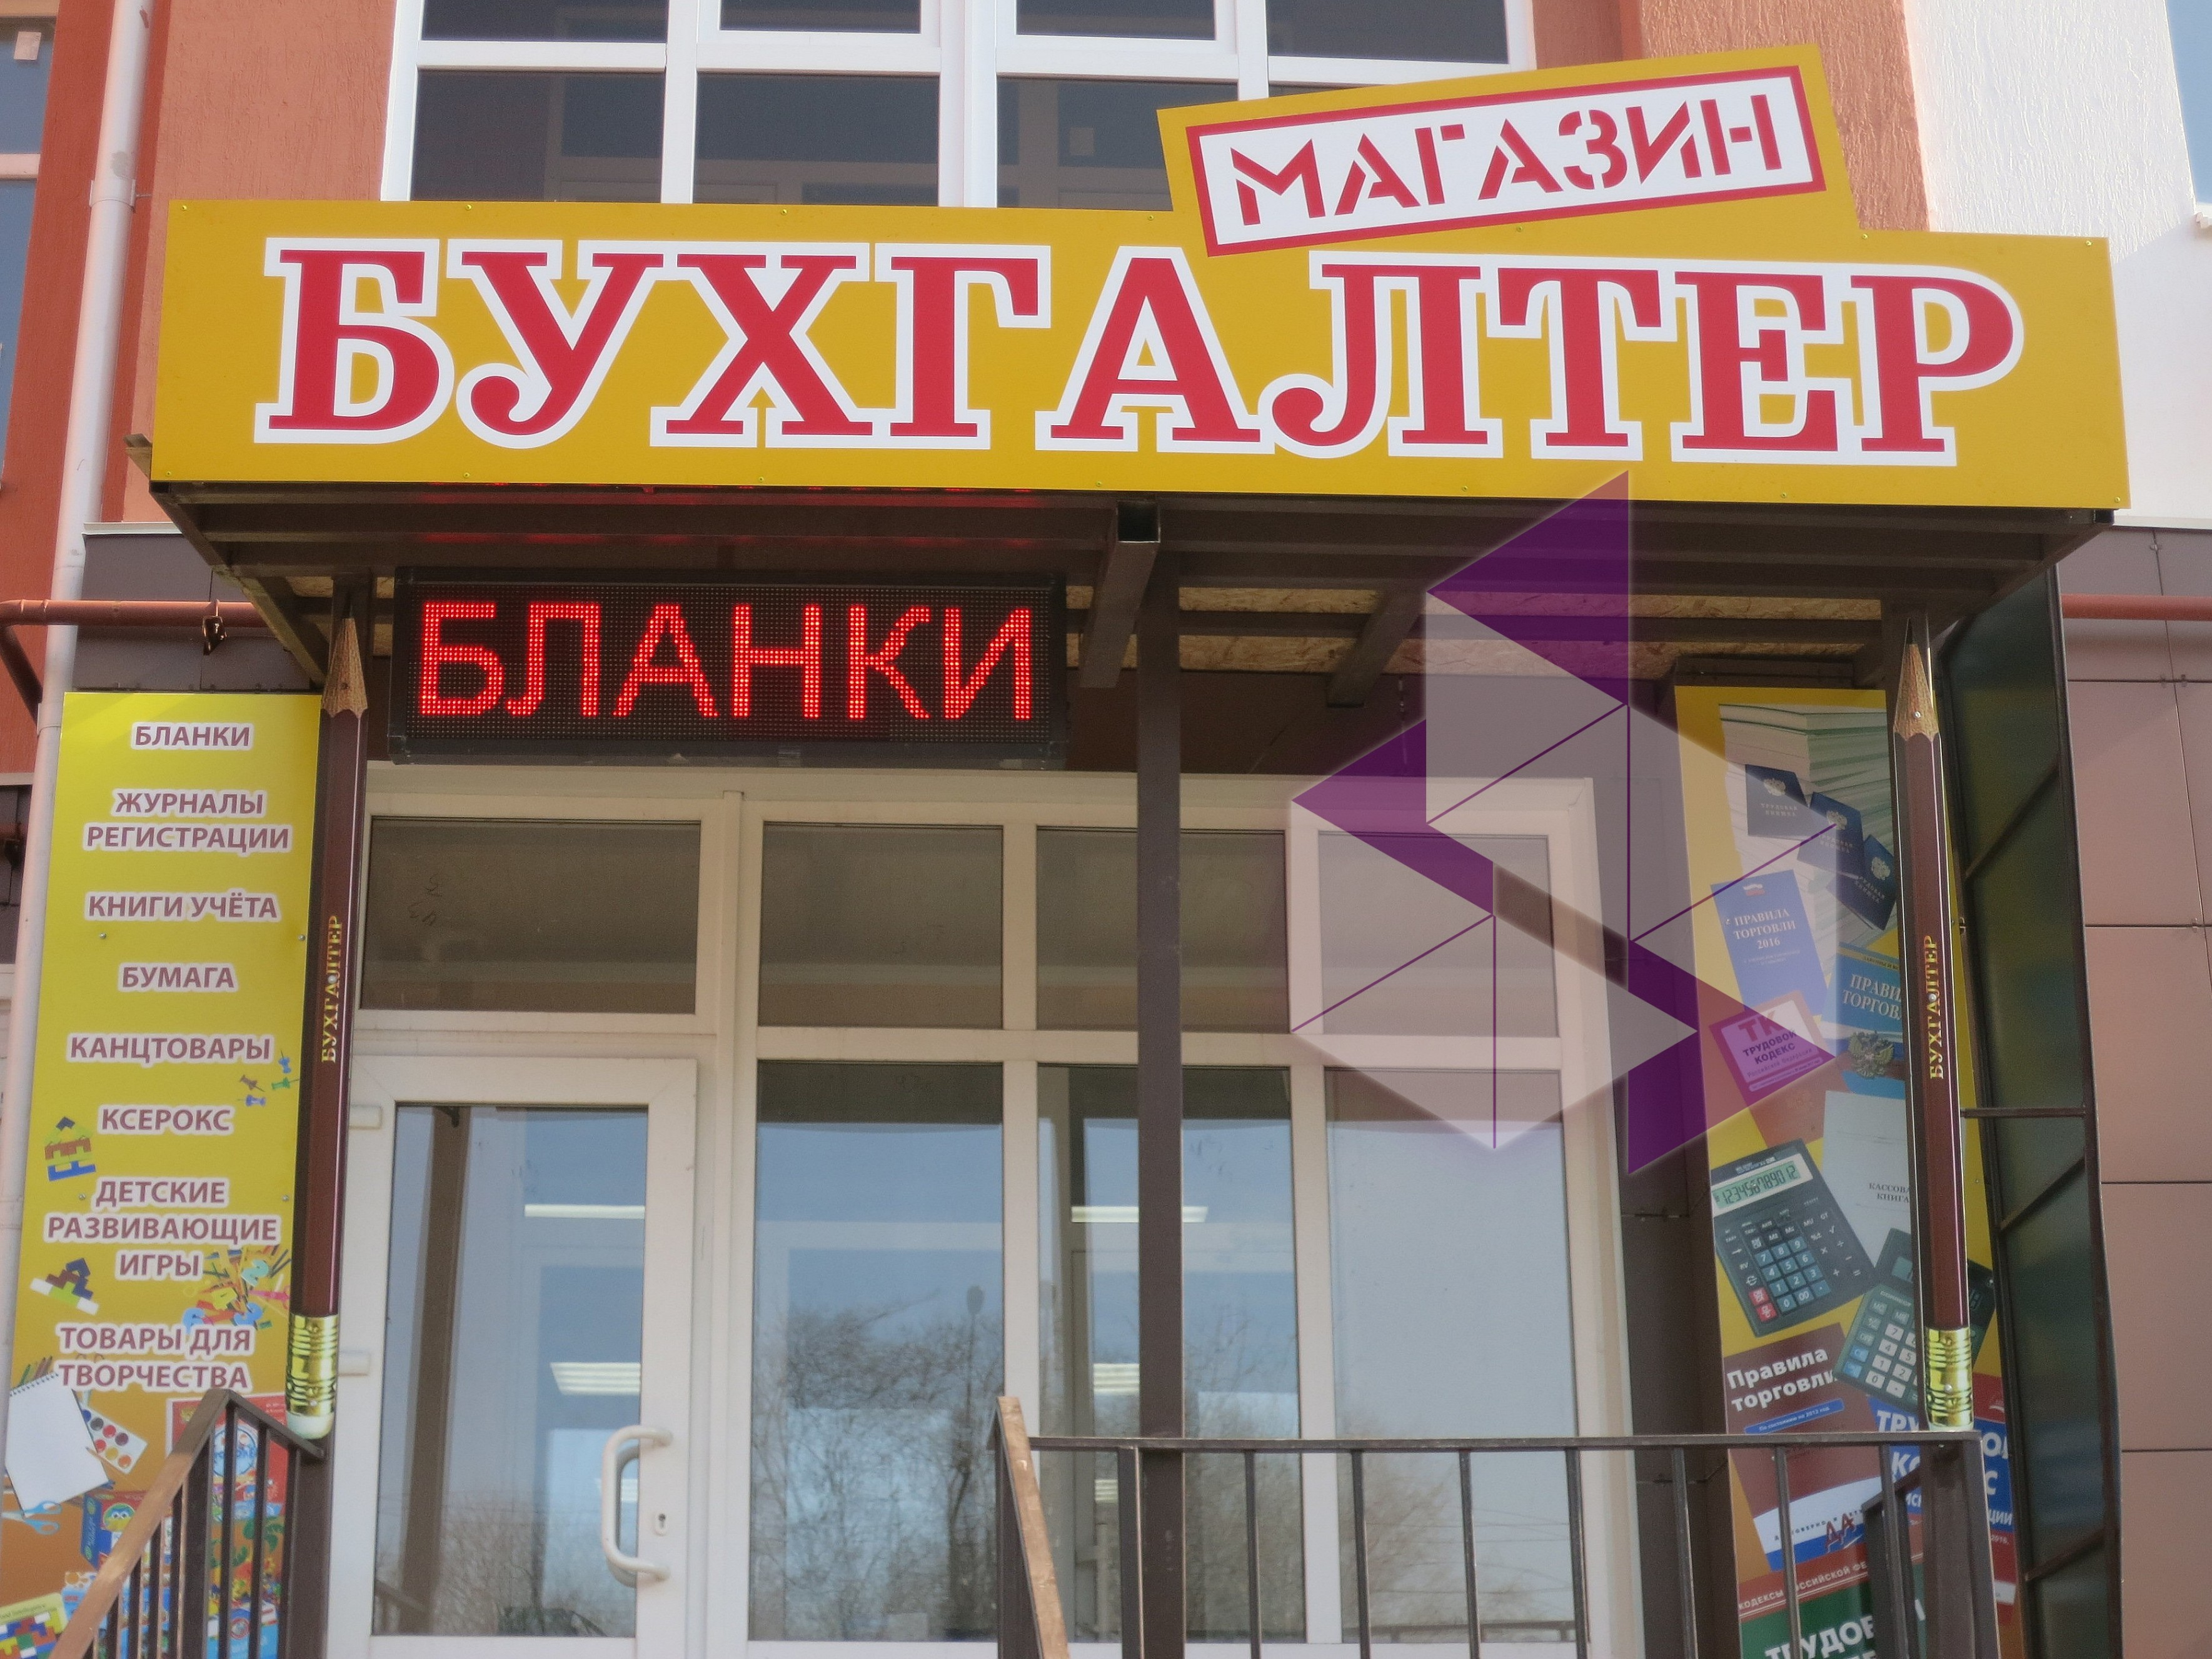 Магазин Бухгалтер Курск Официальный Сайт